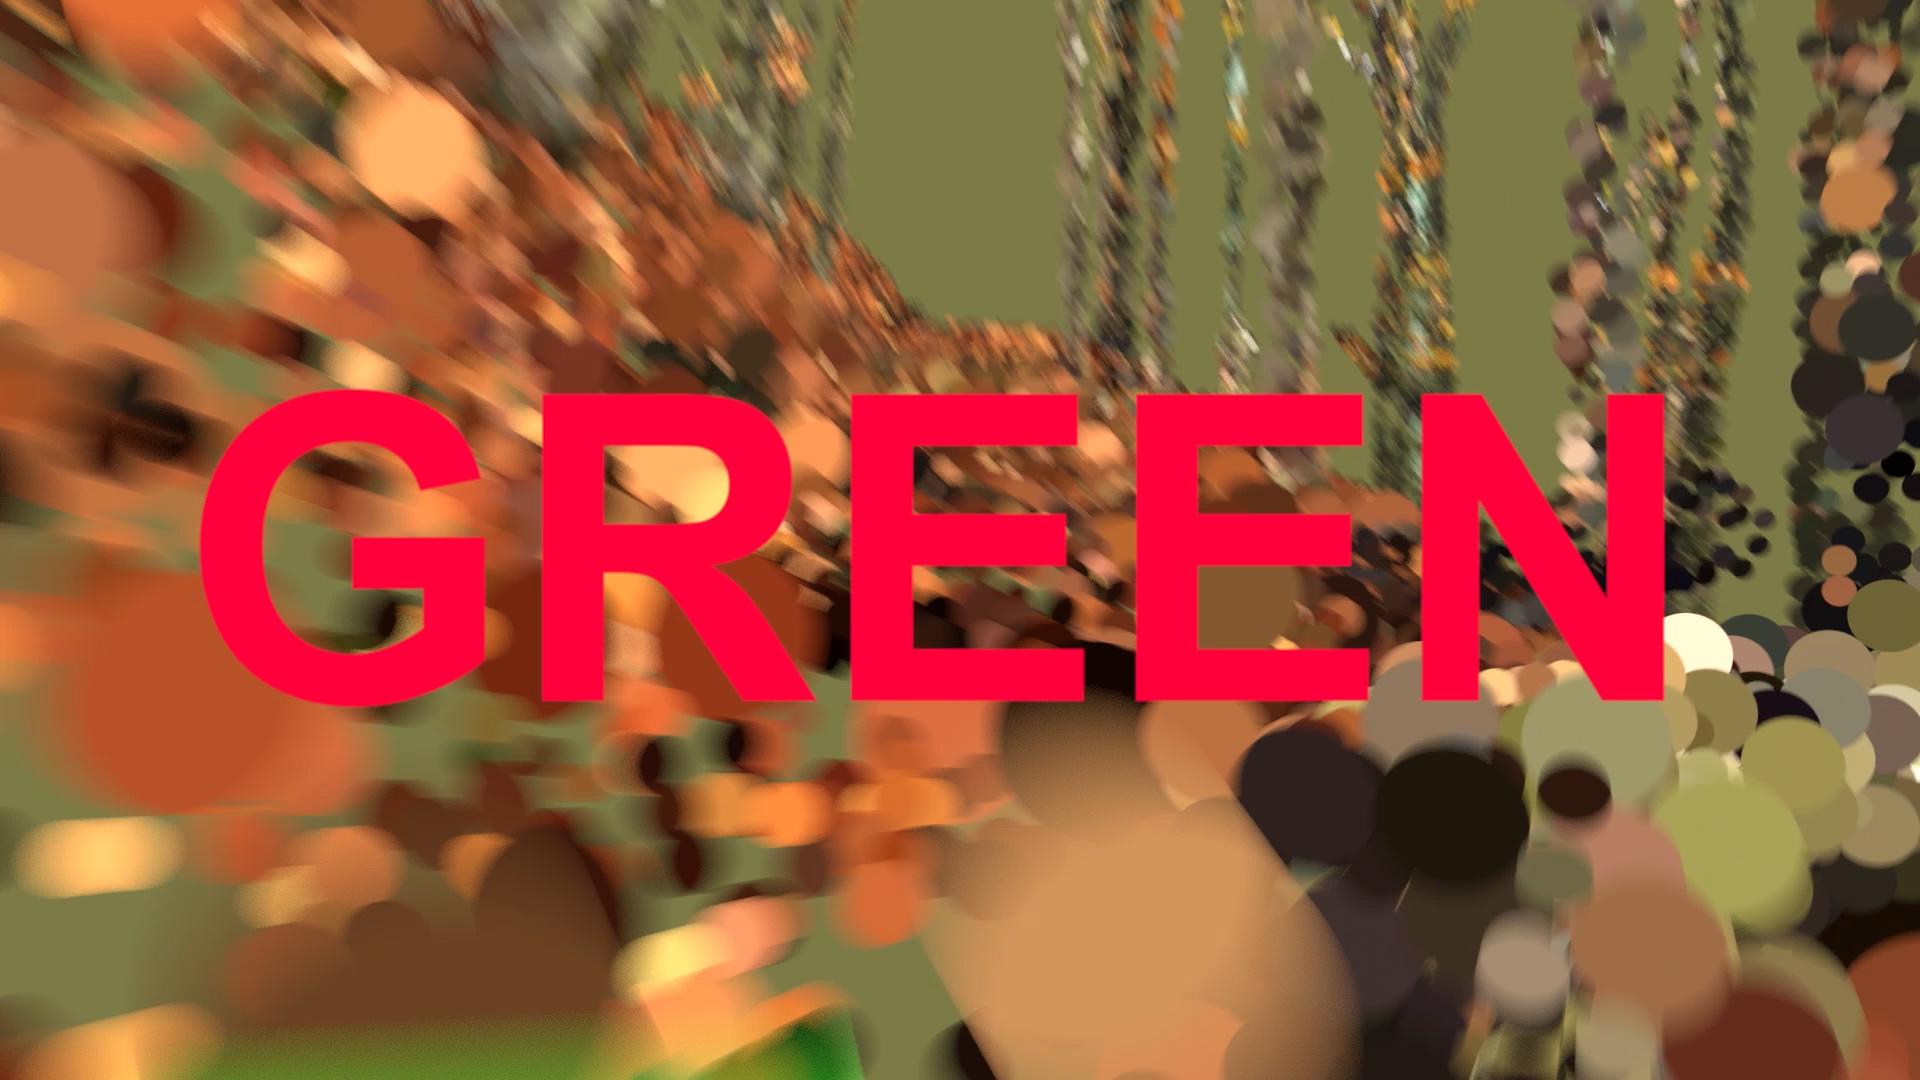 Green01